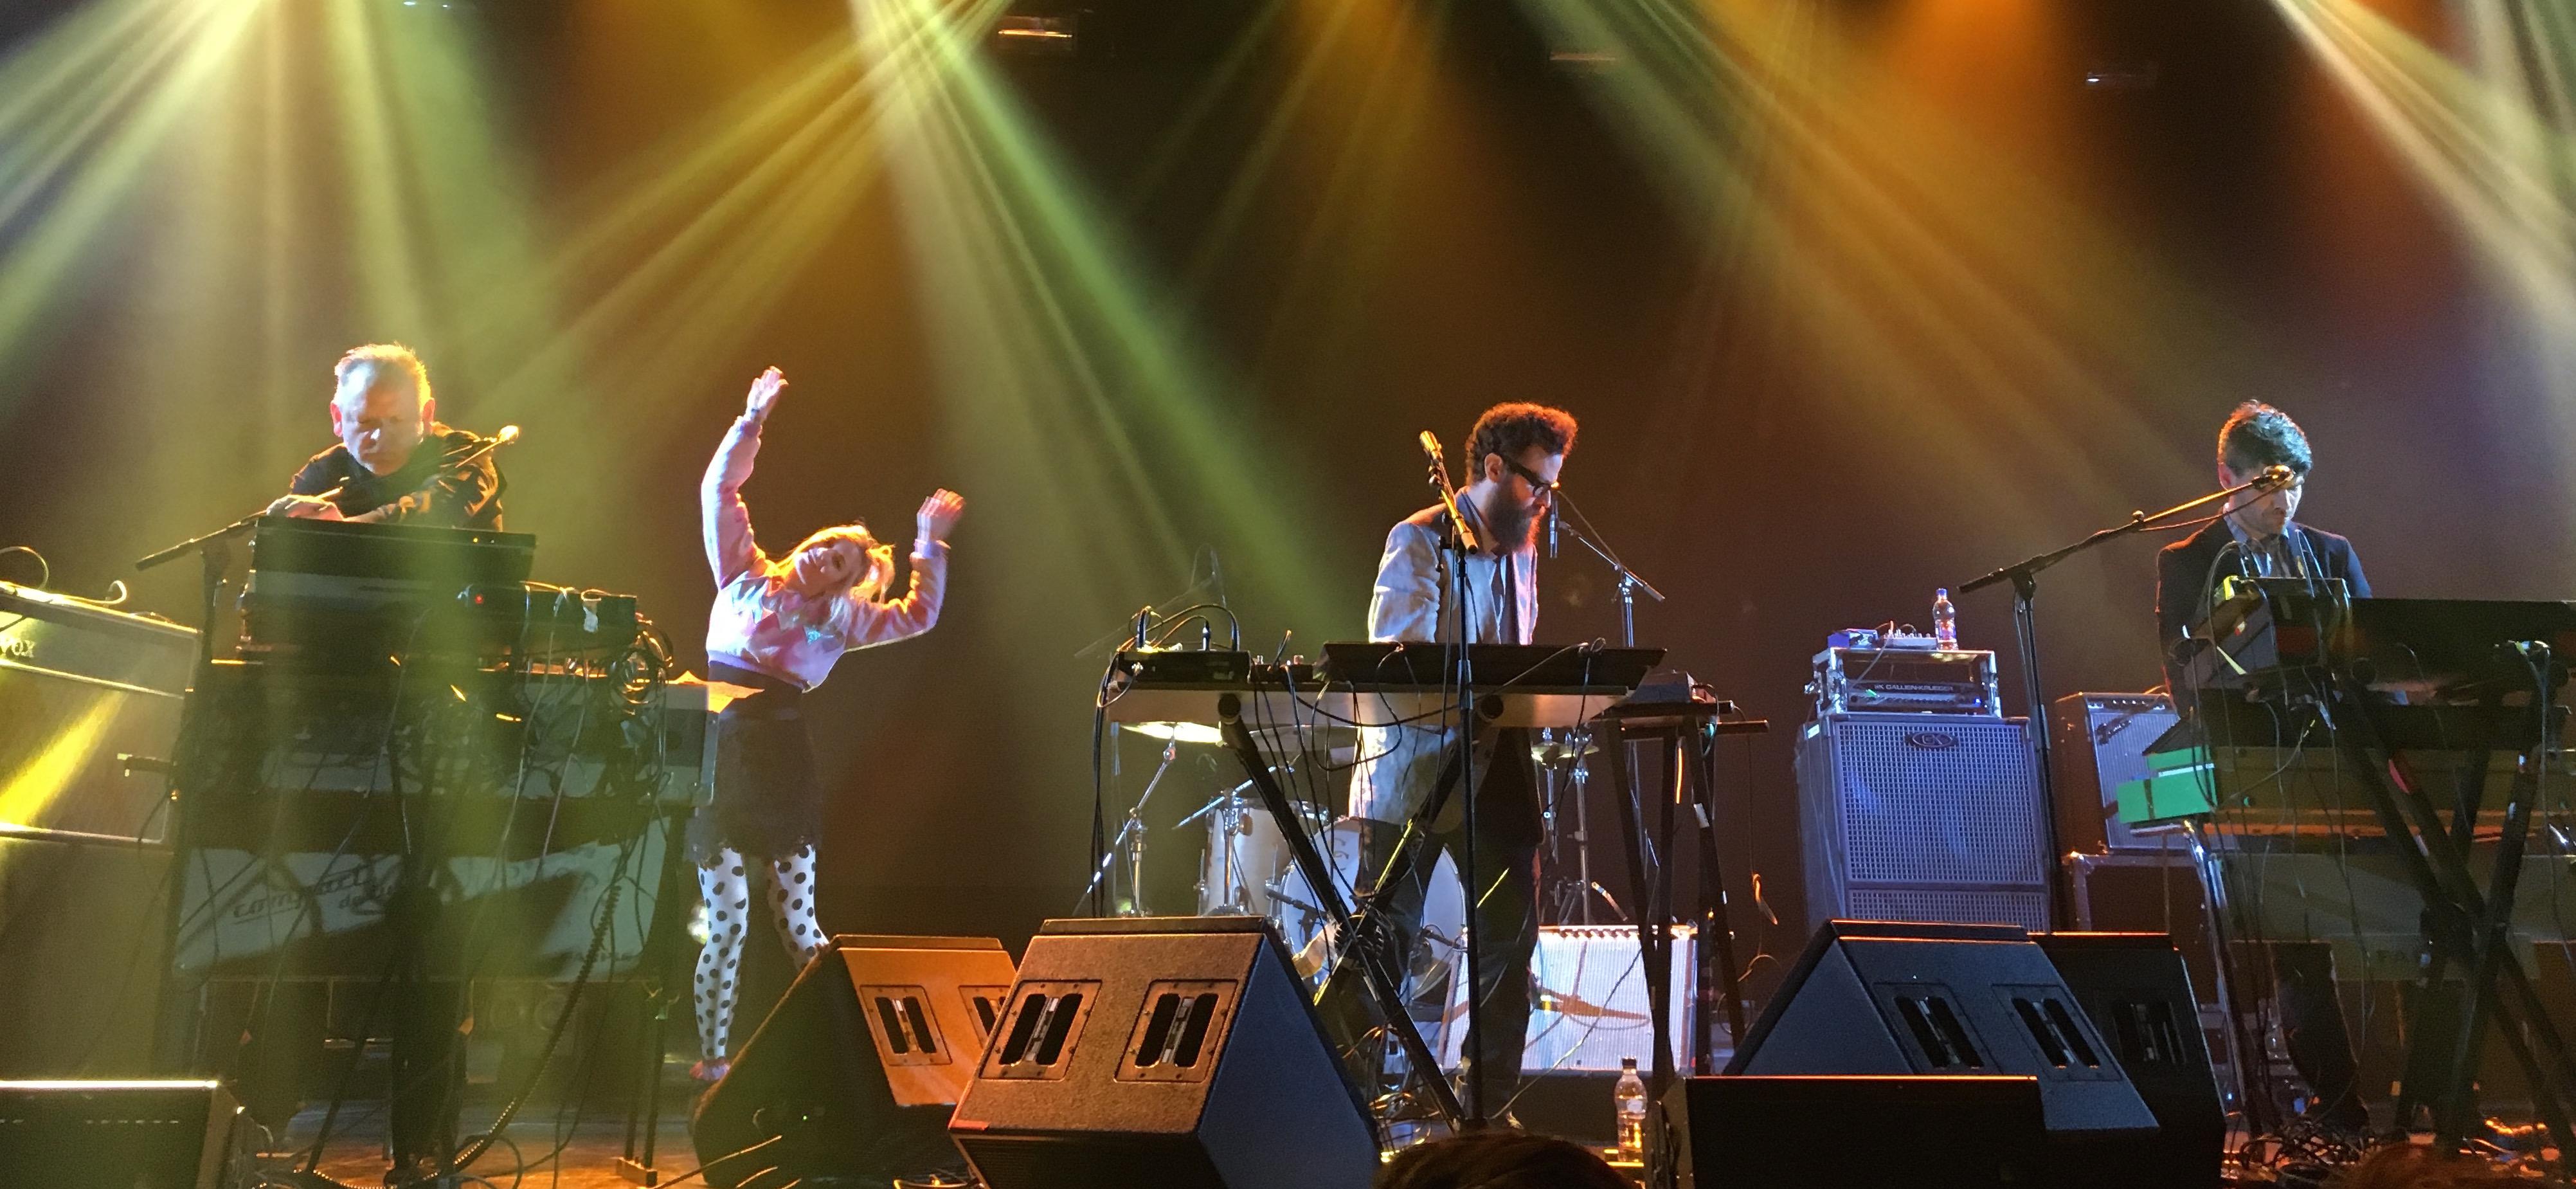 Apparat Organ Quartet @ SonarClub. Foto: Lalai Persson